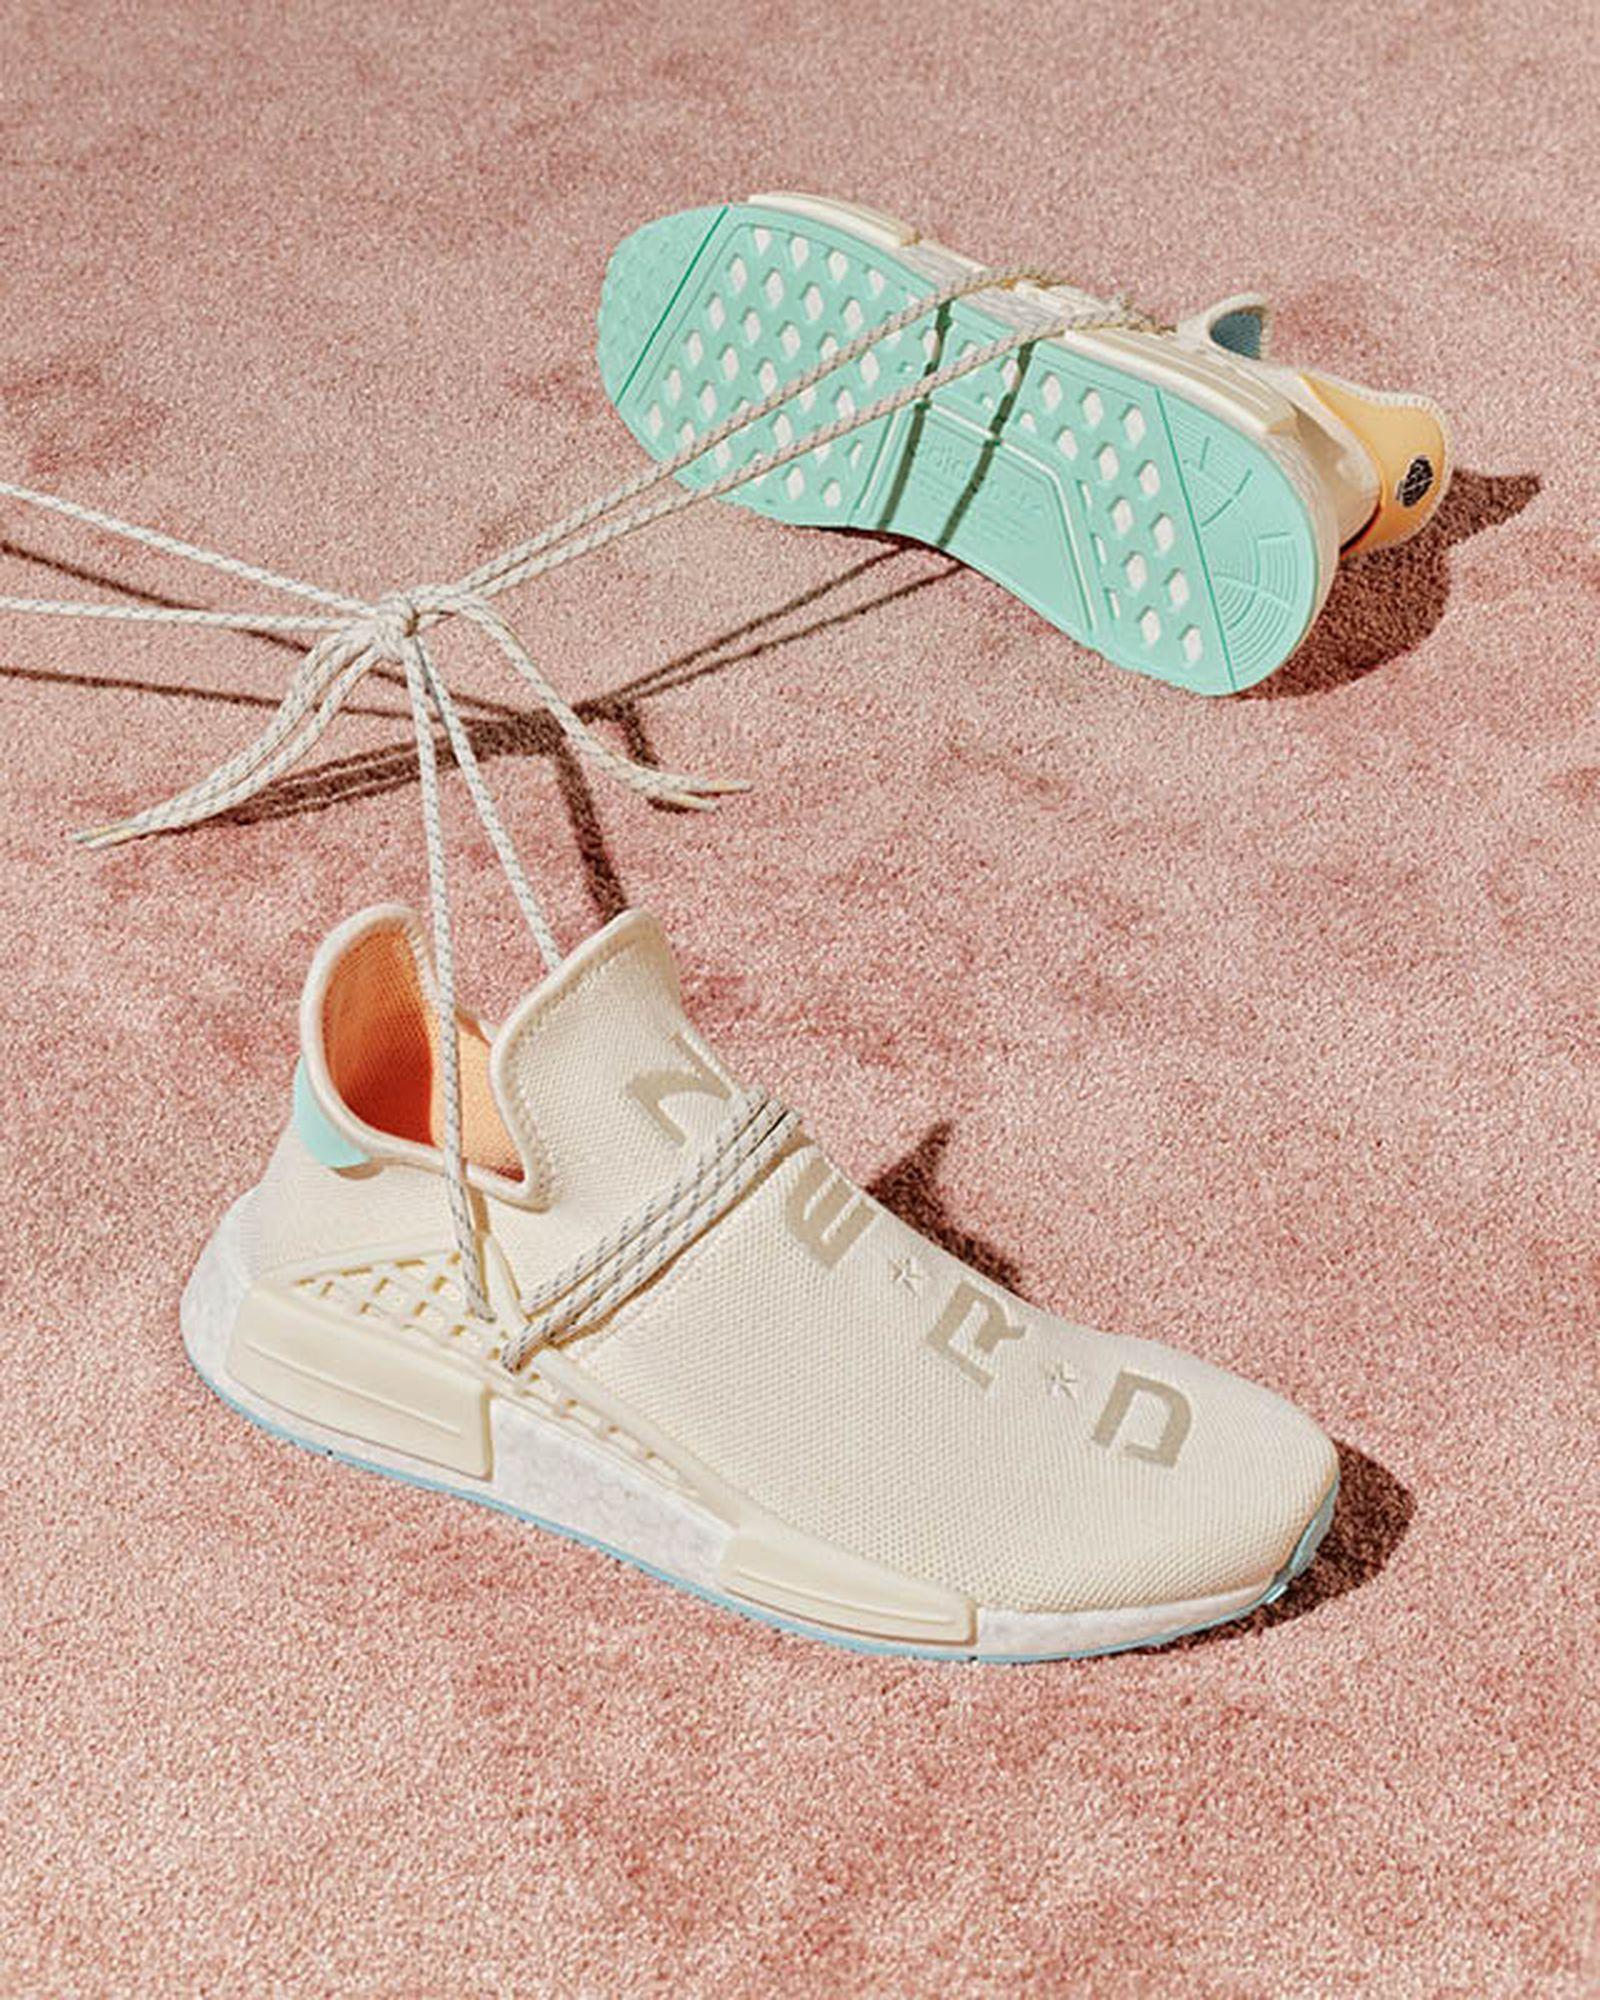 nerd-adidas-nmd-hu-release-date-price-01